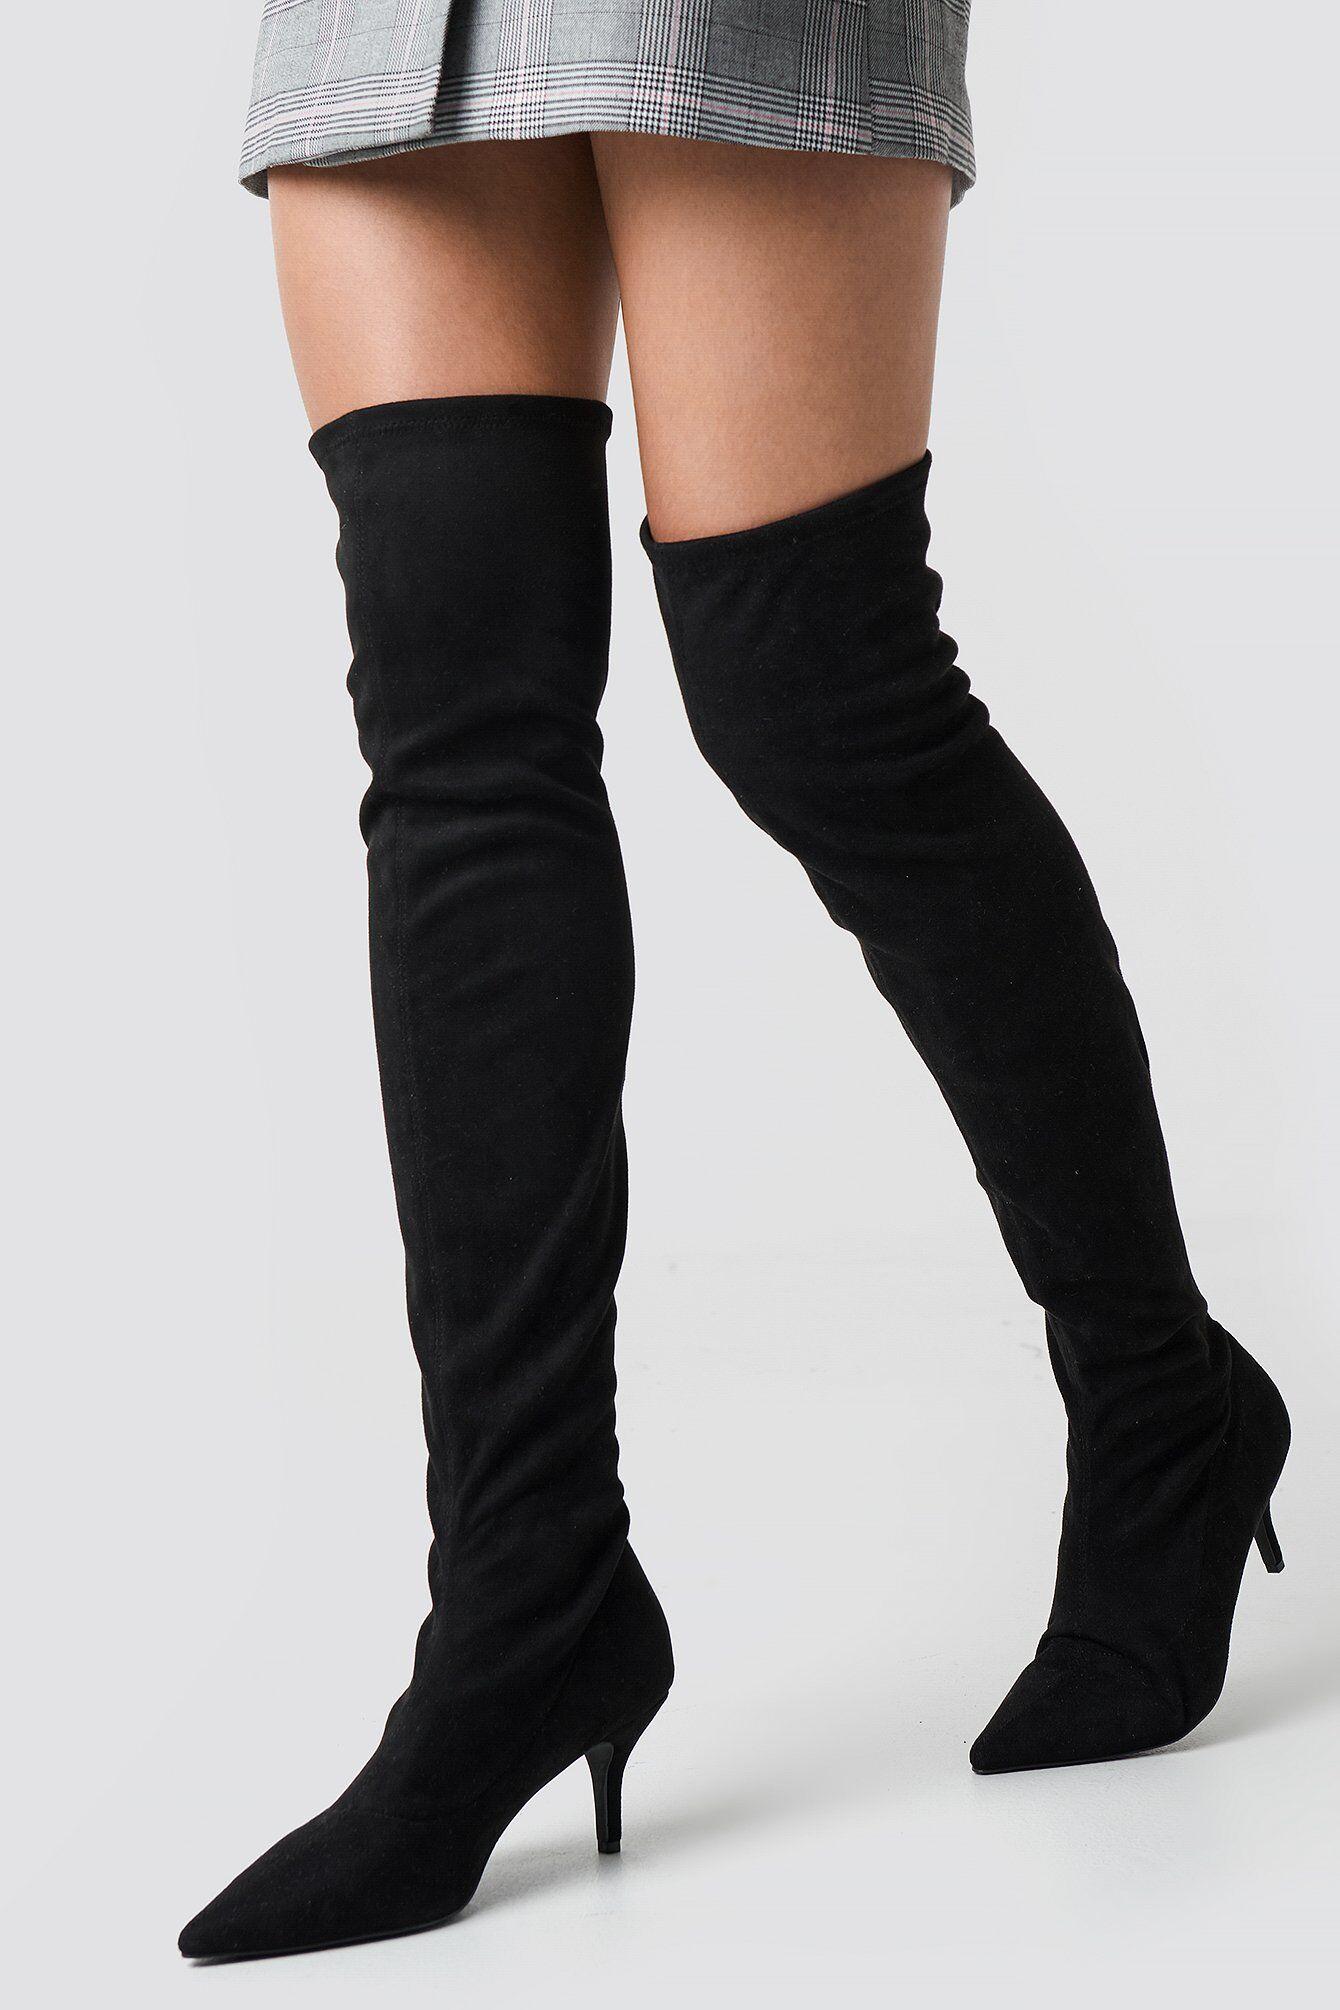 NA-KD Shoes Overknee Kitten Heel Boots - Black